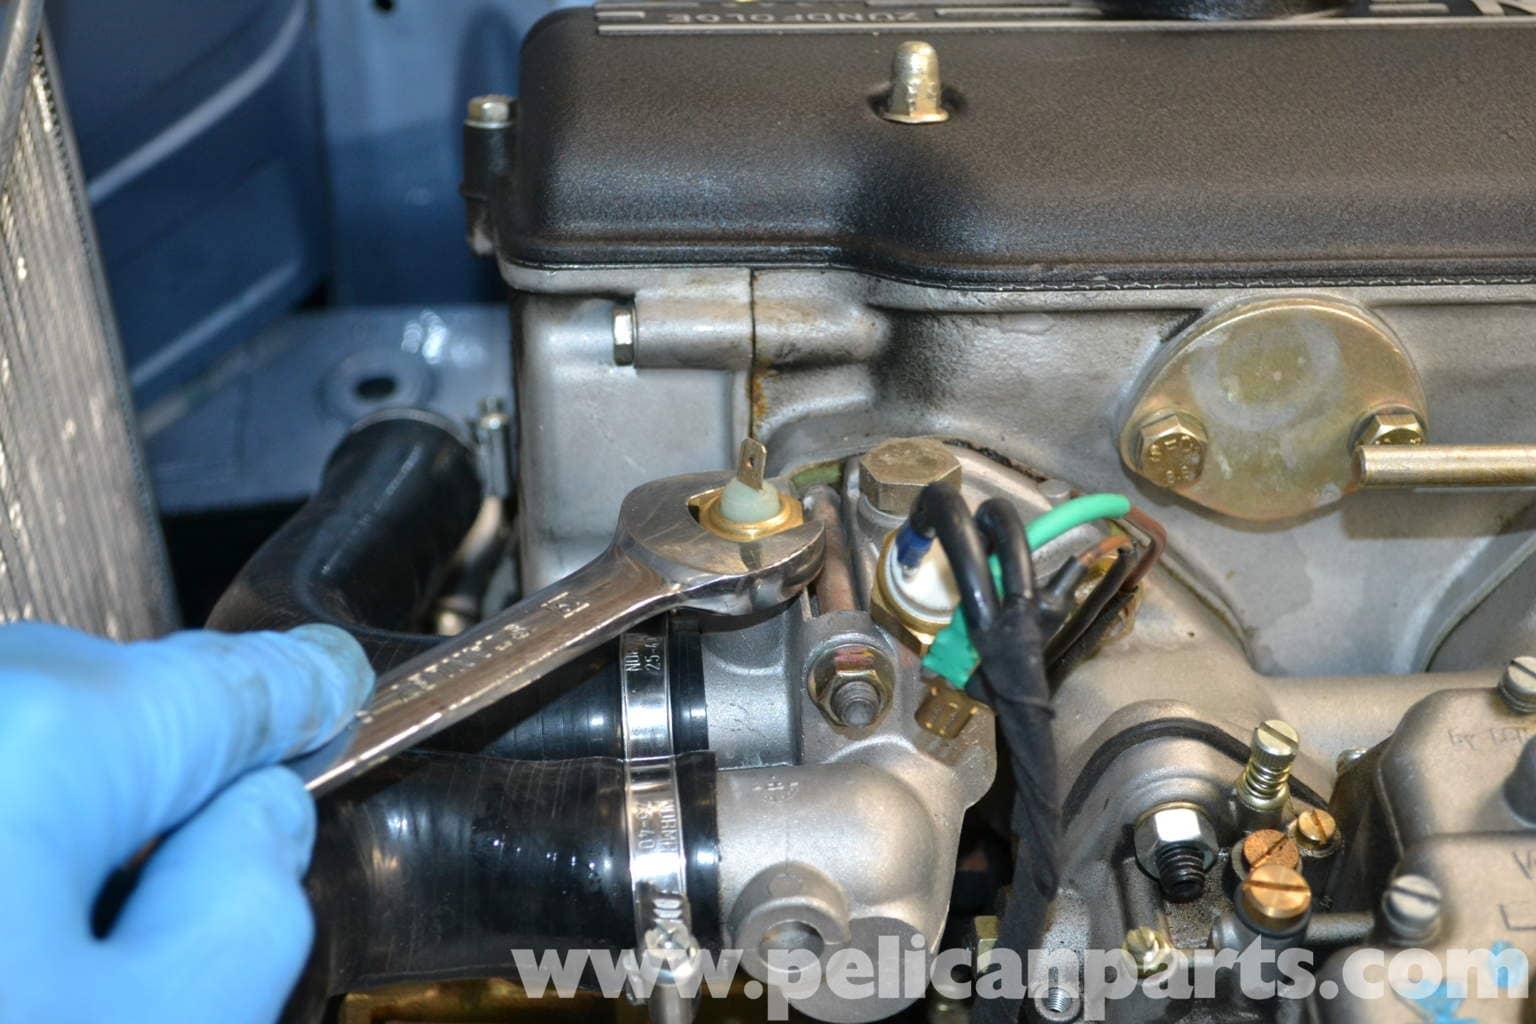 Engine Coolant Temperature Sensor >> BMW 2002 Coolant Temperature Sensor Replacement (1966-1976) | Pelican Parts DIY Maintenance Article